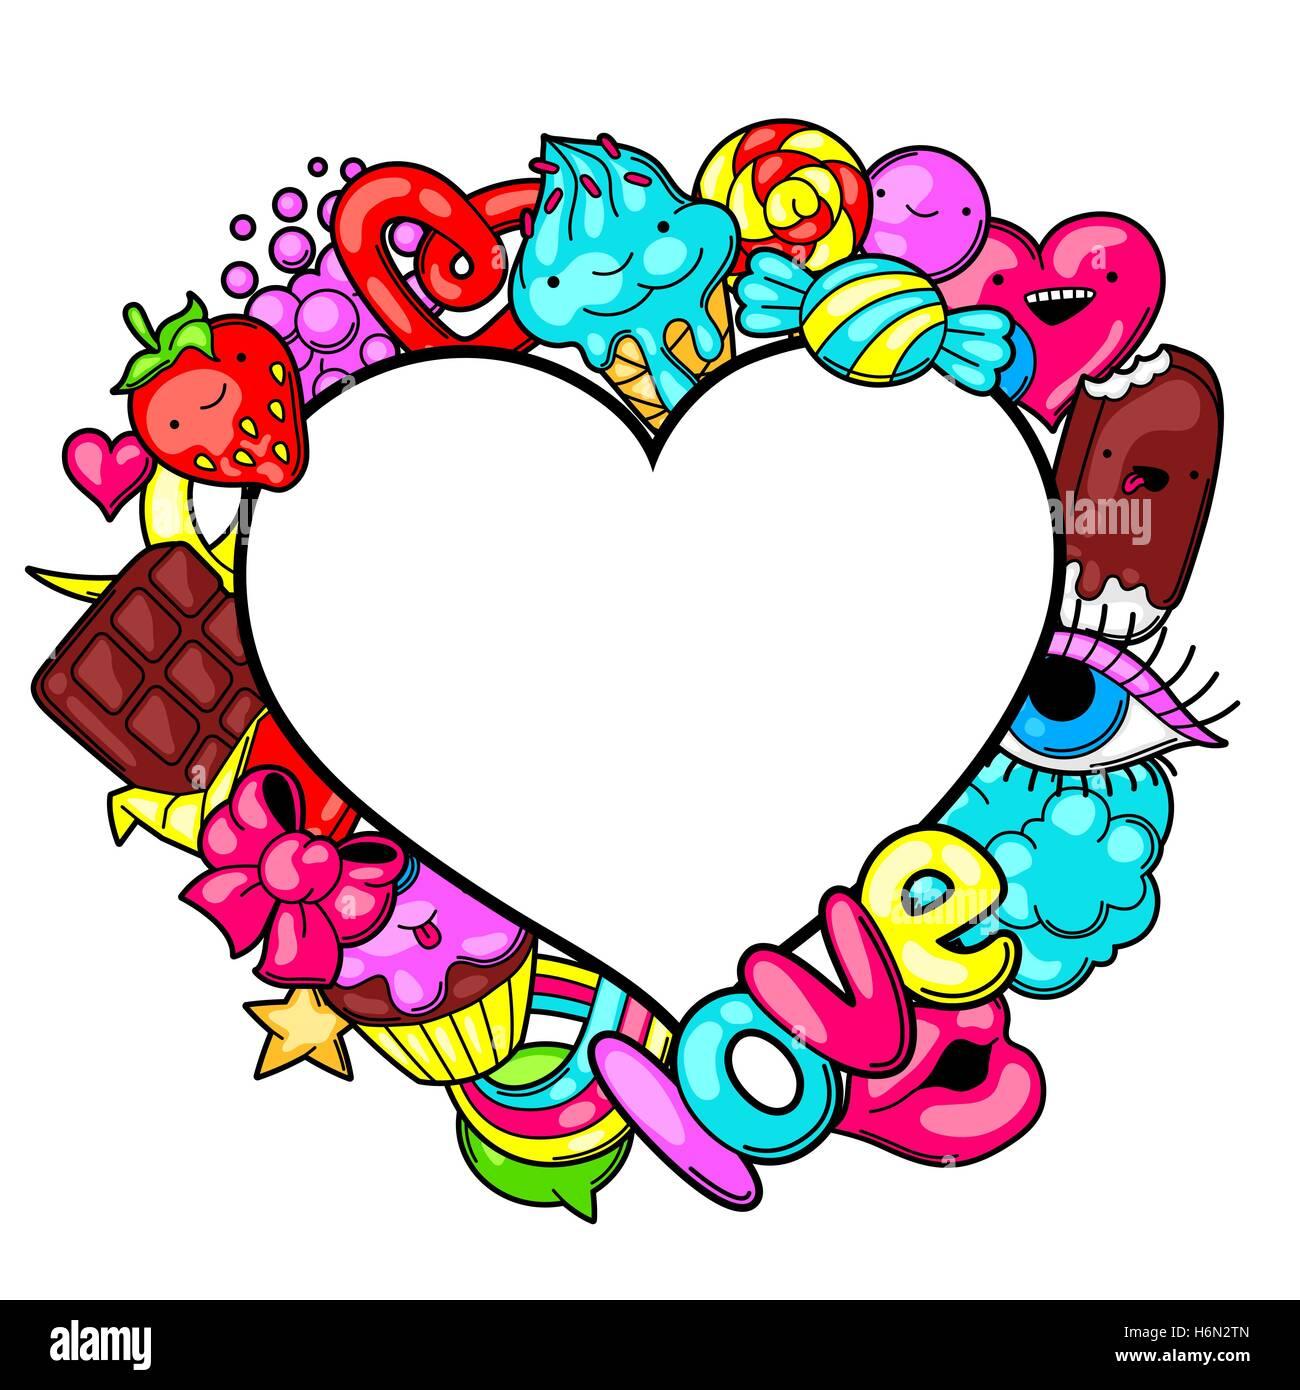 Heart Cartoon Chocolate Bar Sweet Stock Photos & Heart